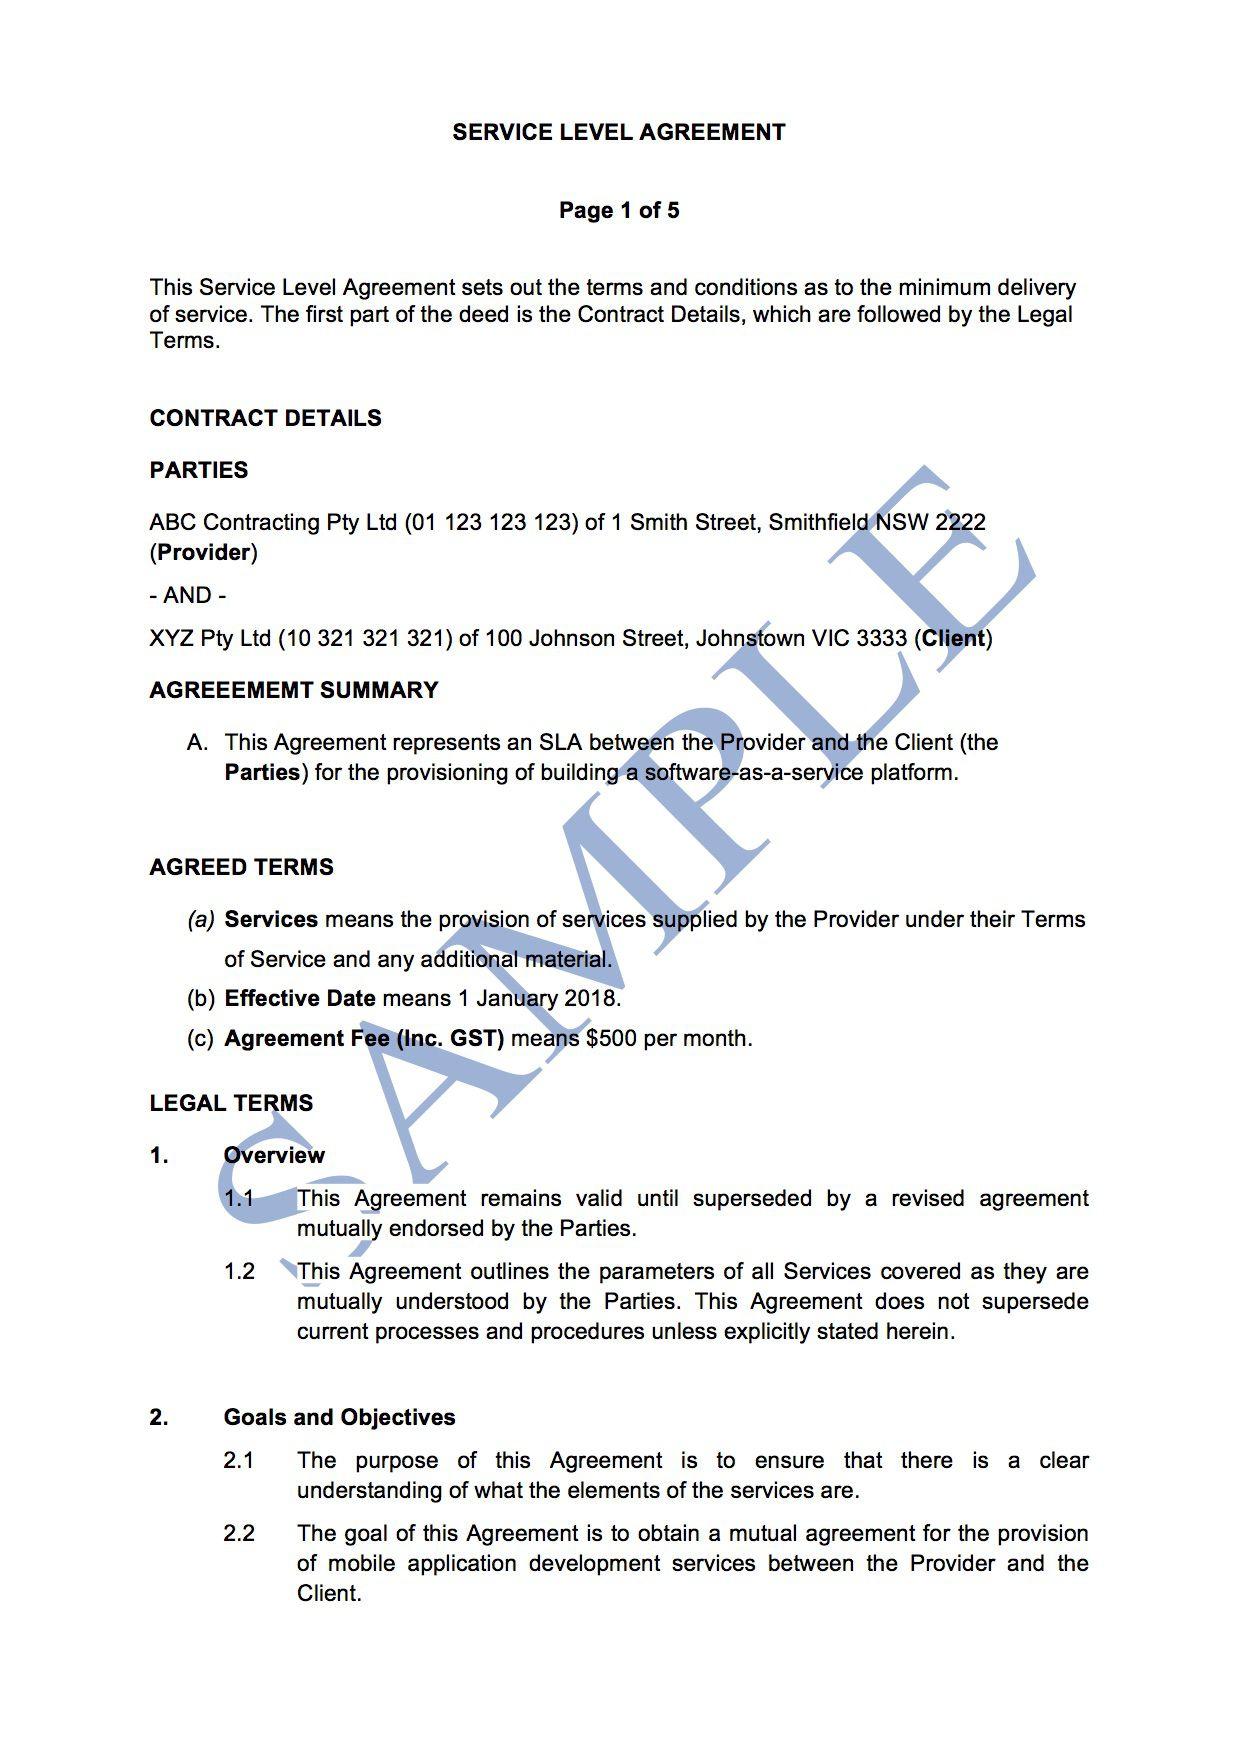 006 Best Service Level Agreement Template Concept  South Africa Nz For Website DevelopmentFull